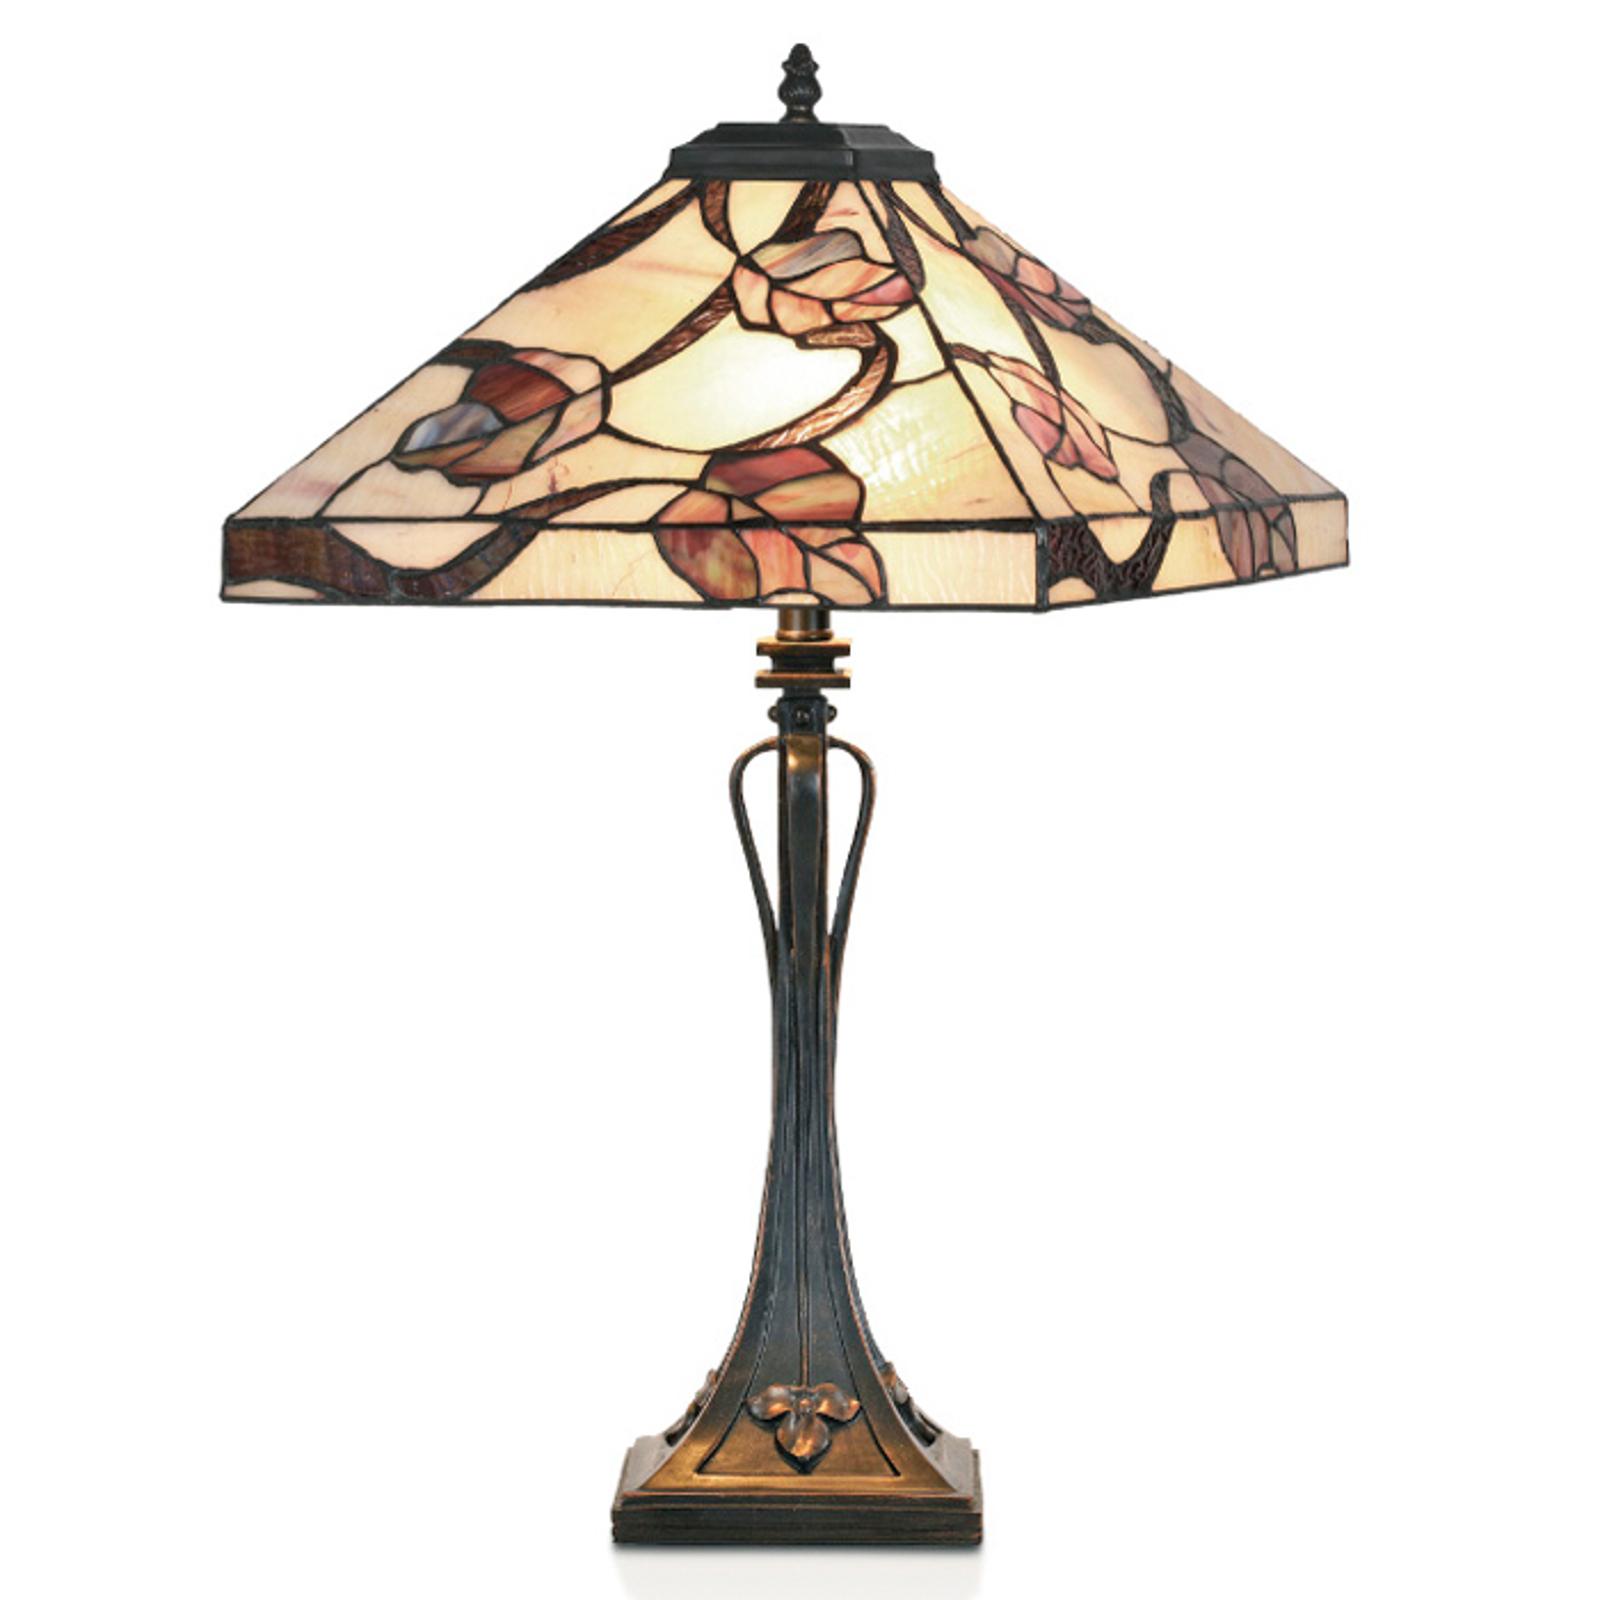 Tafellamp APPOLONIA in Tiffany-stijl